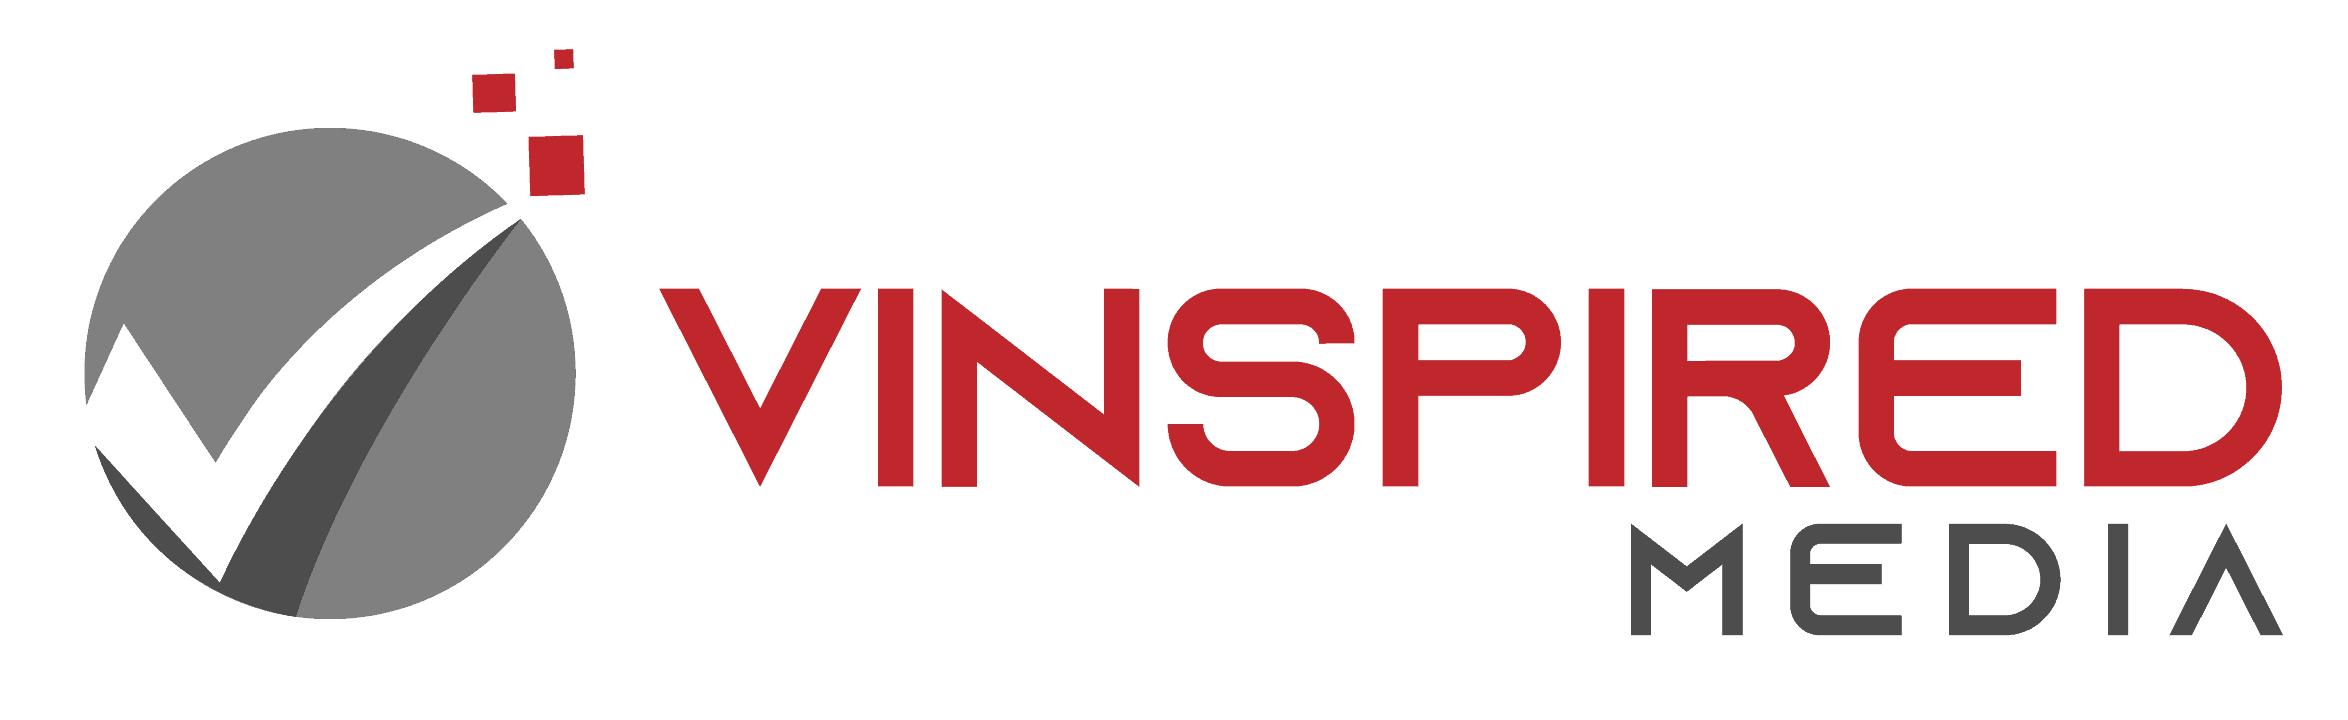 vinspired media logo with digital check mark icon